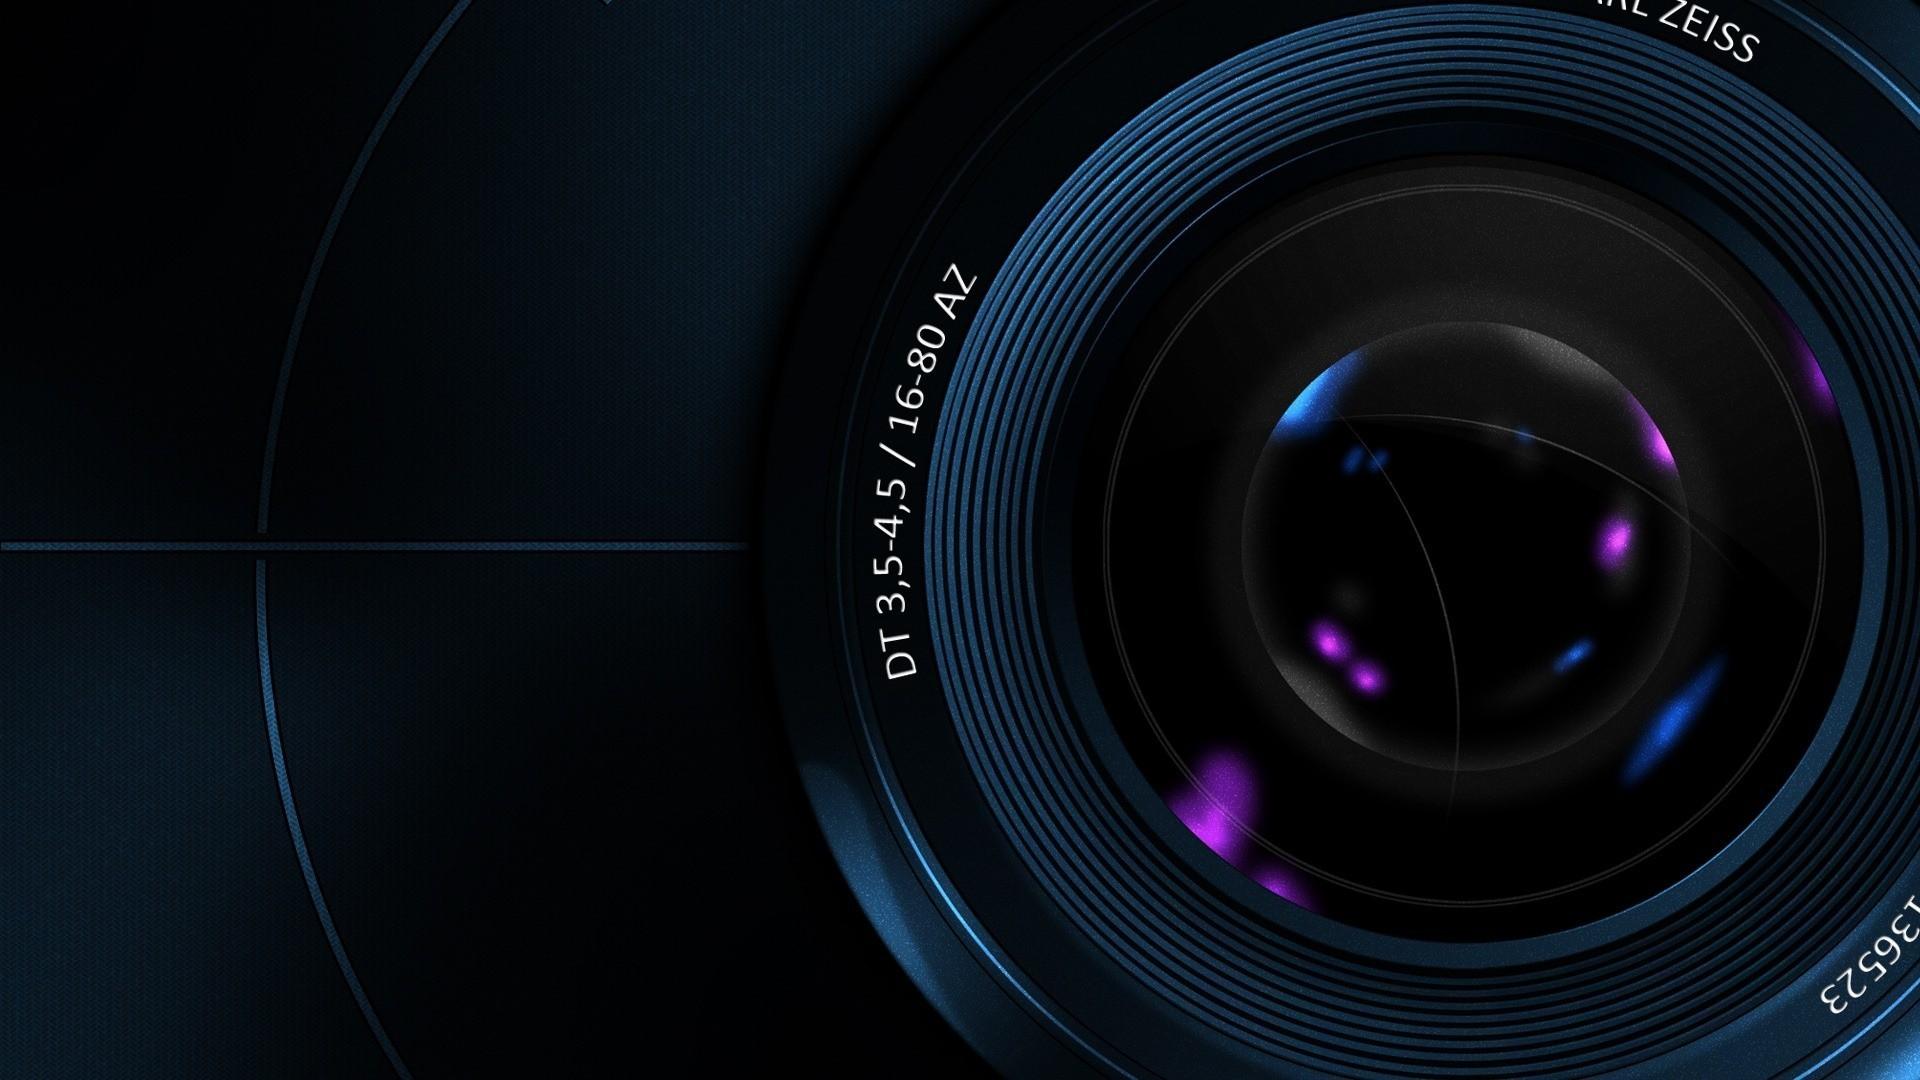 Camera Lens Abstract Wallpaper